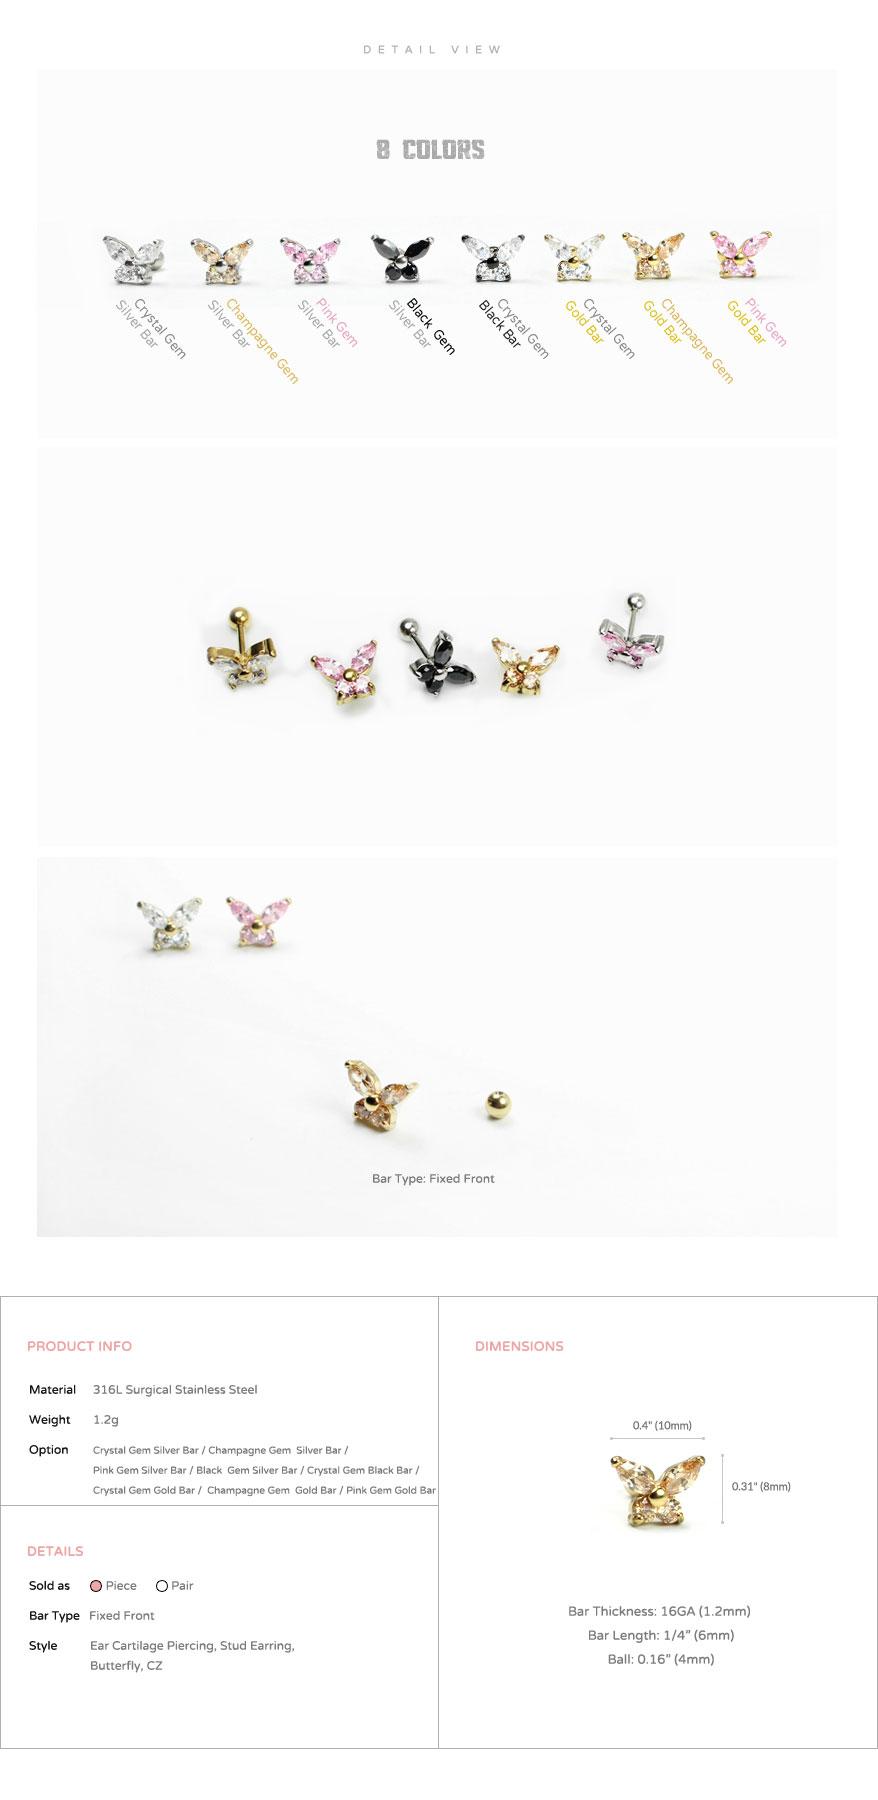 ear_studs_piercing_Cartilage_16g_316l_Stainless_Steel_earring_korean_asian_style_barbell_Butterfly_gem_cubic_cz_4